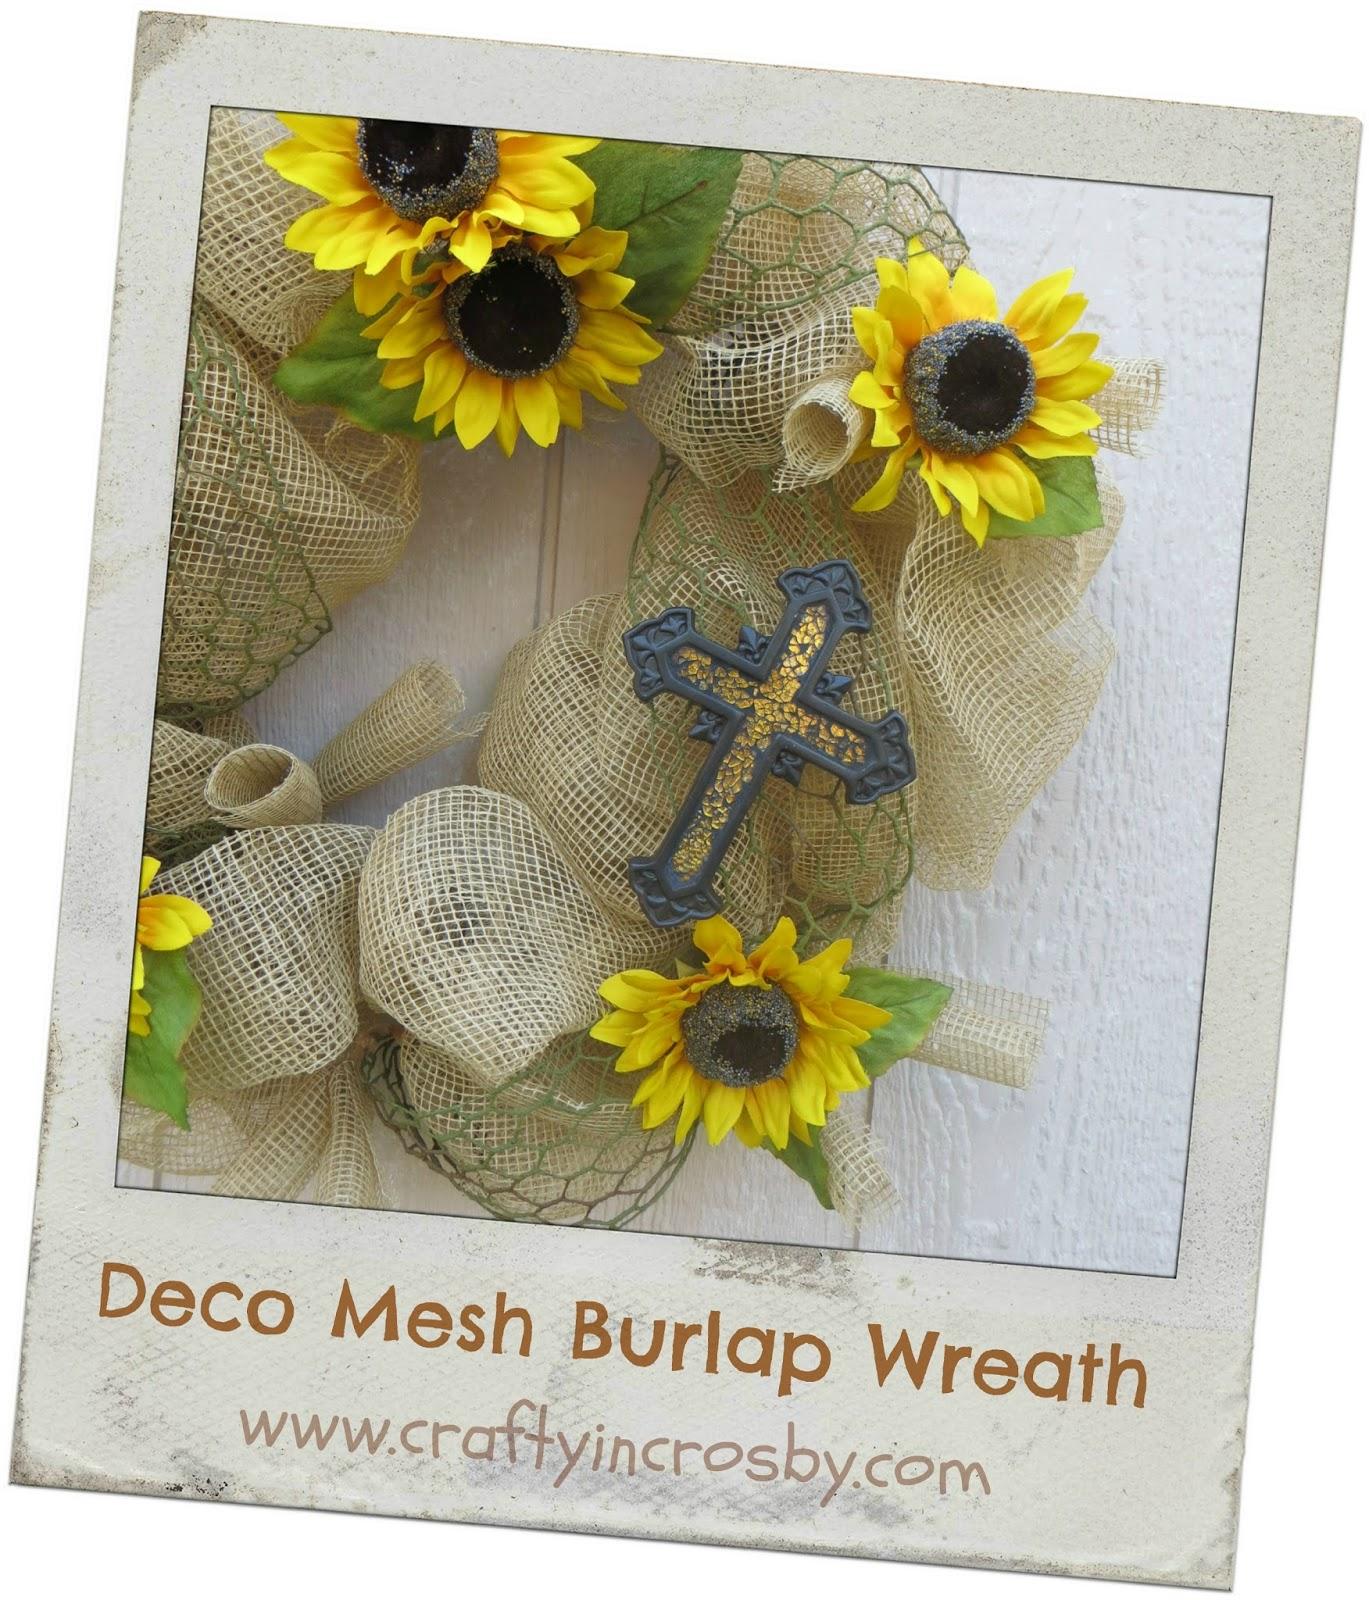 Crafty in Crosby: Summery Sunflower and Burlap Wreath